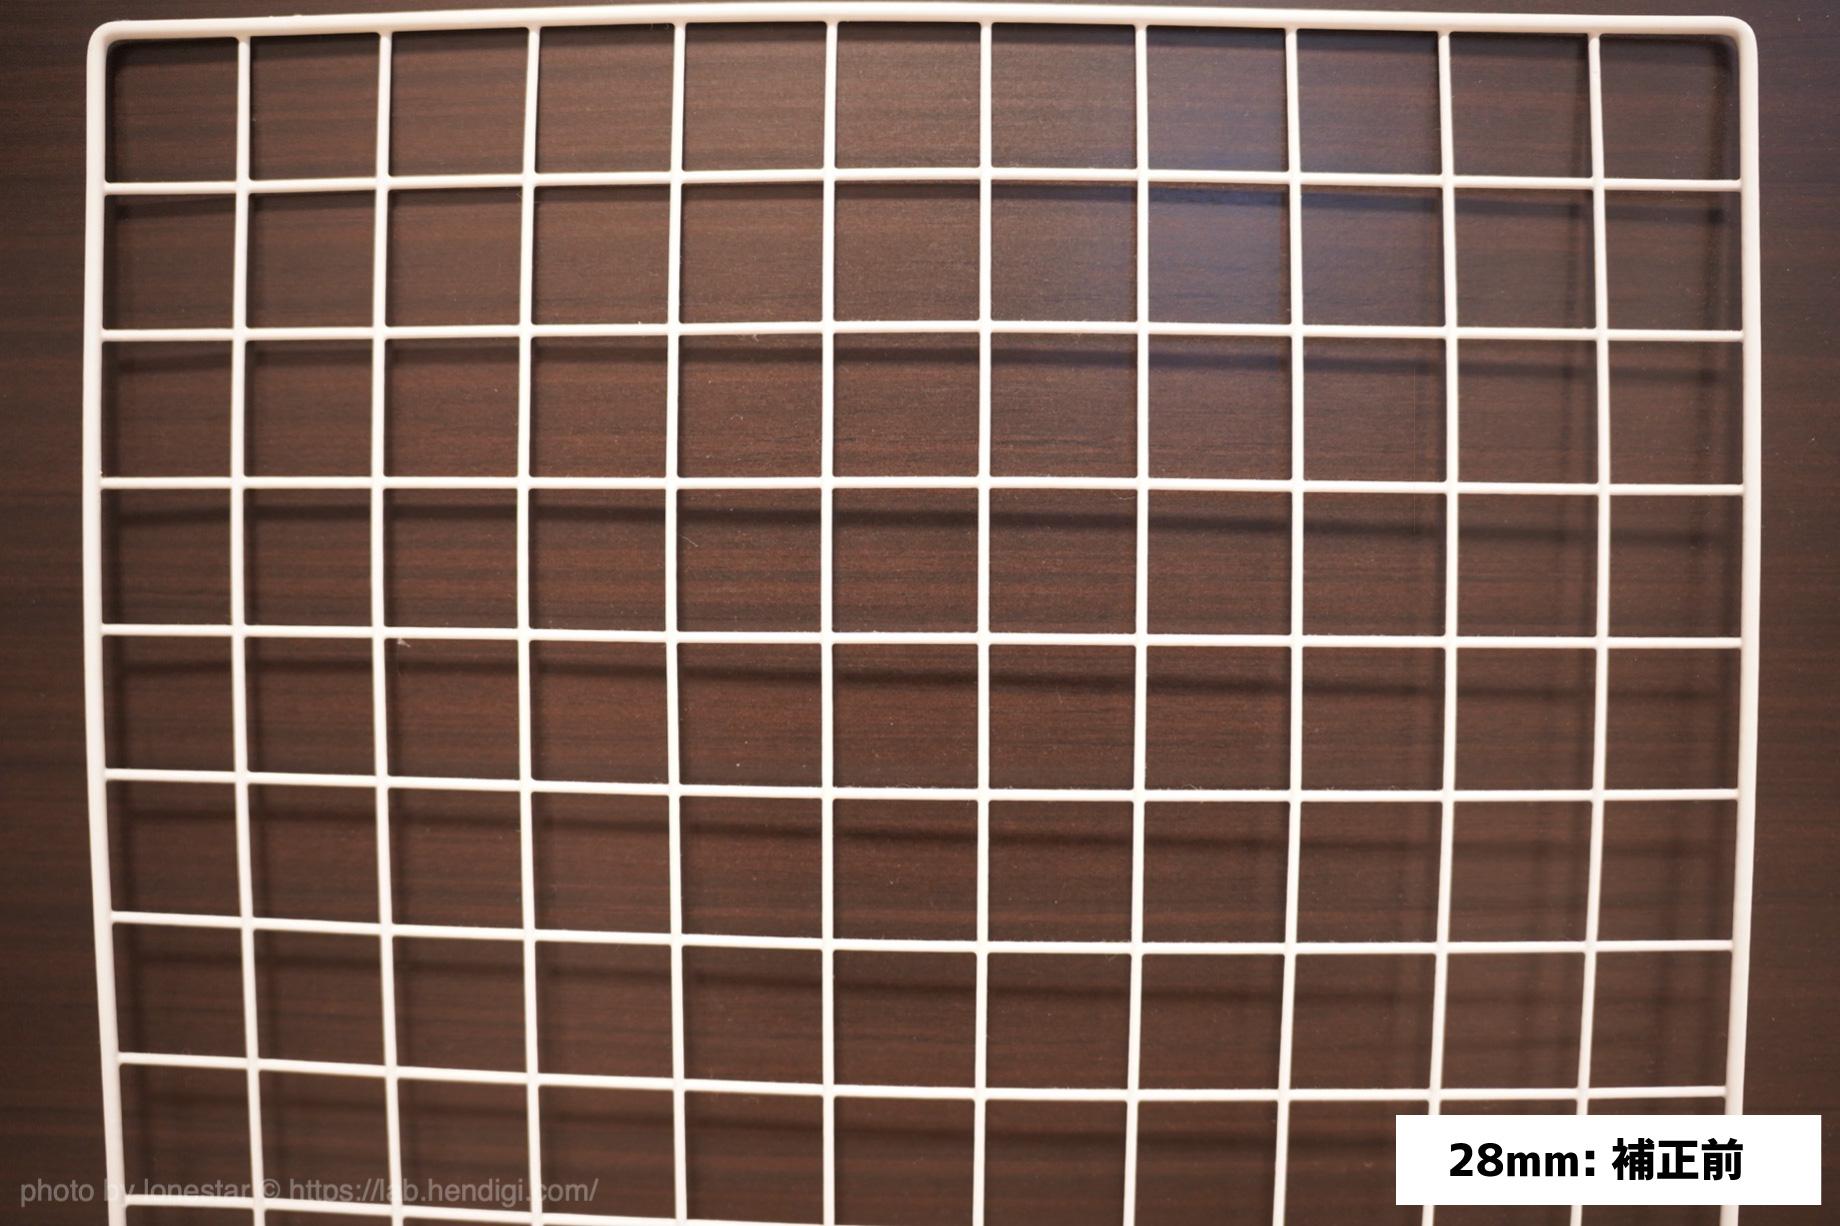 SIGMA 28-70mm F2.8 DG DN 歪曲収差 28mm